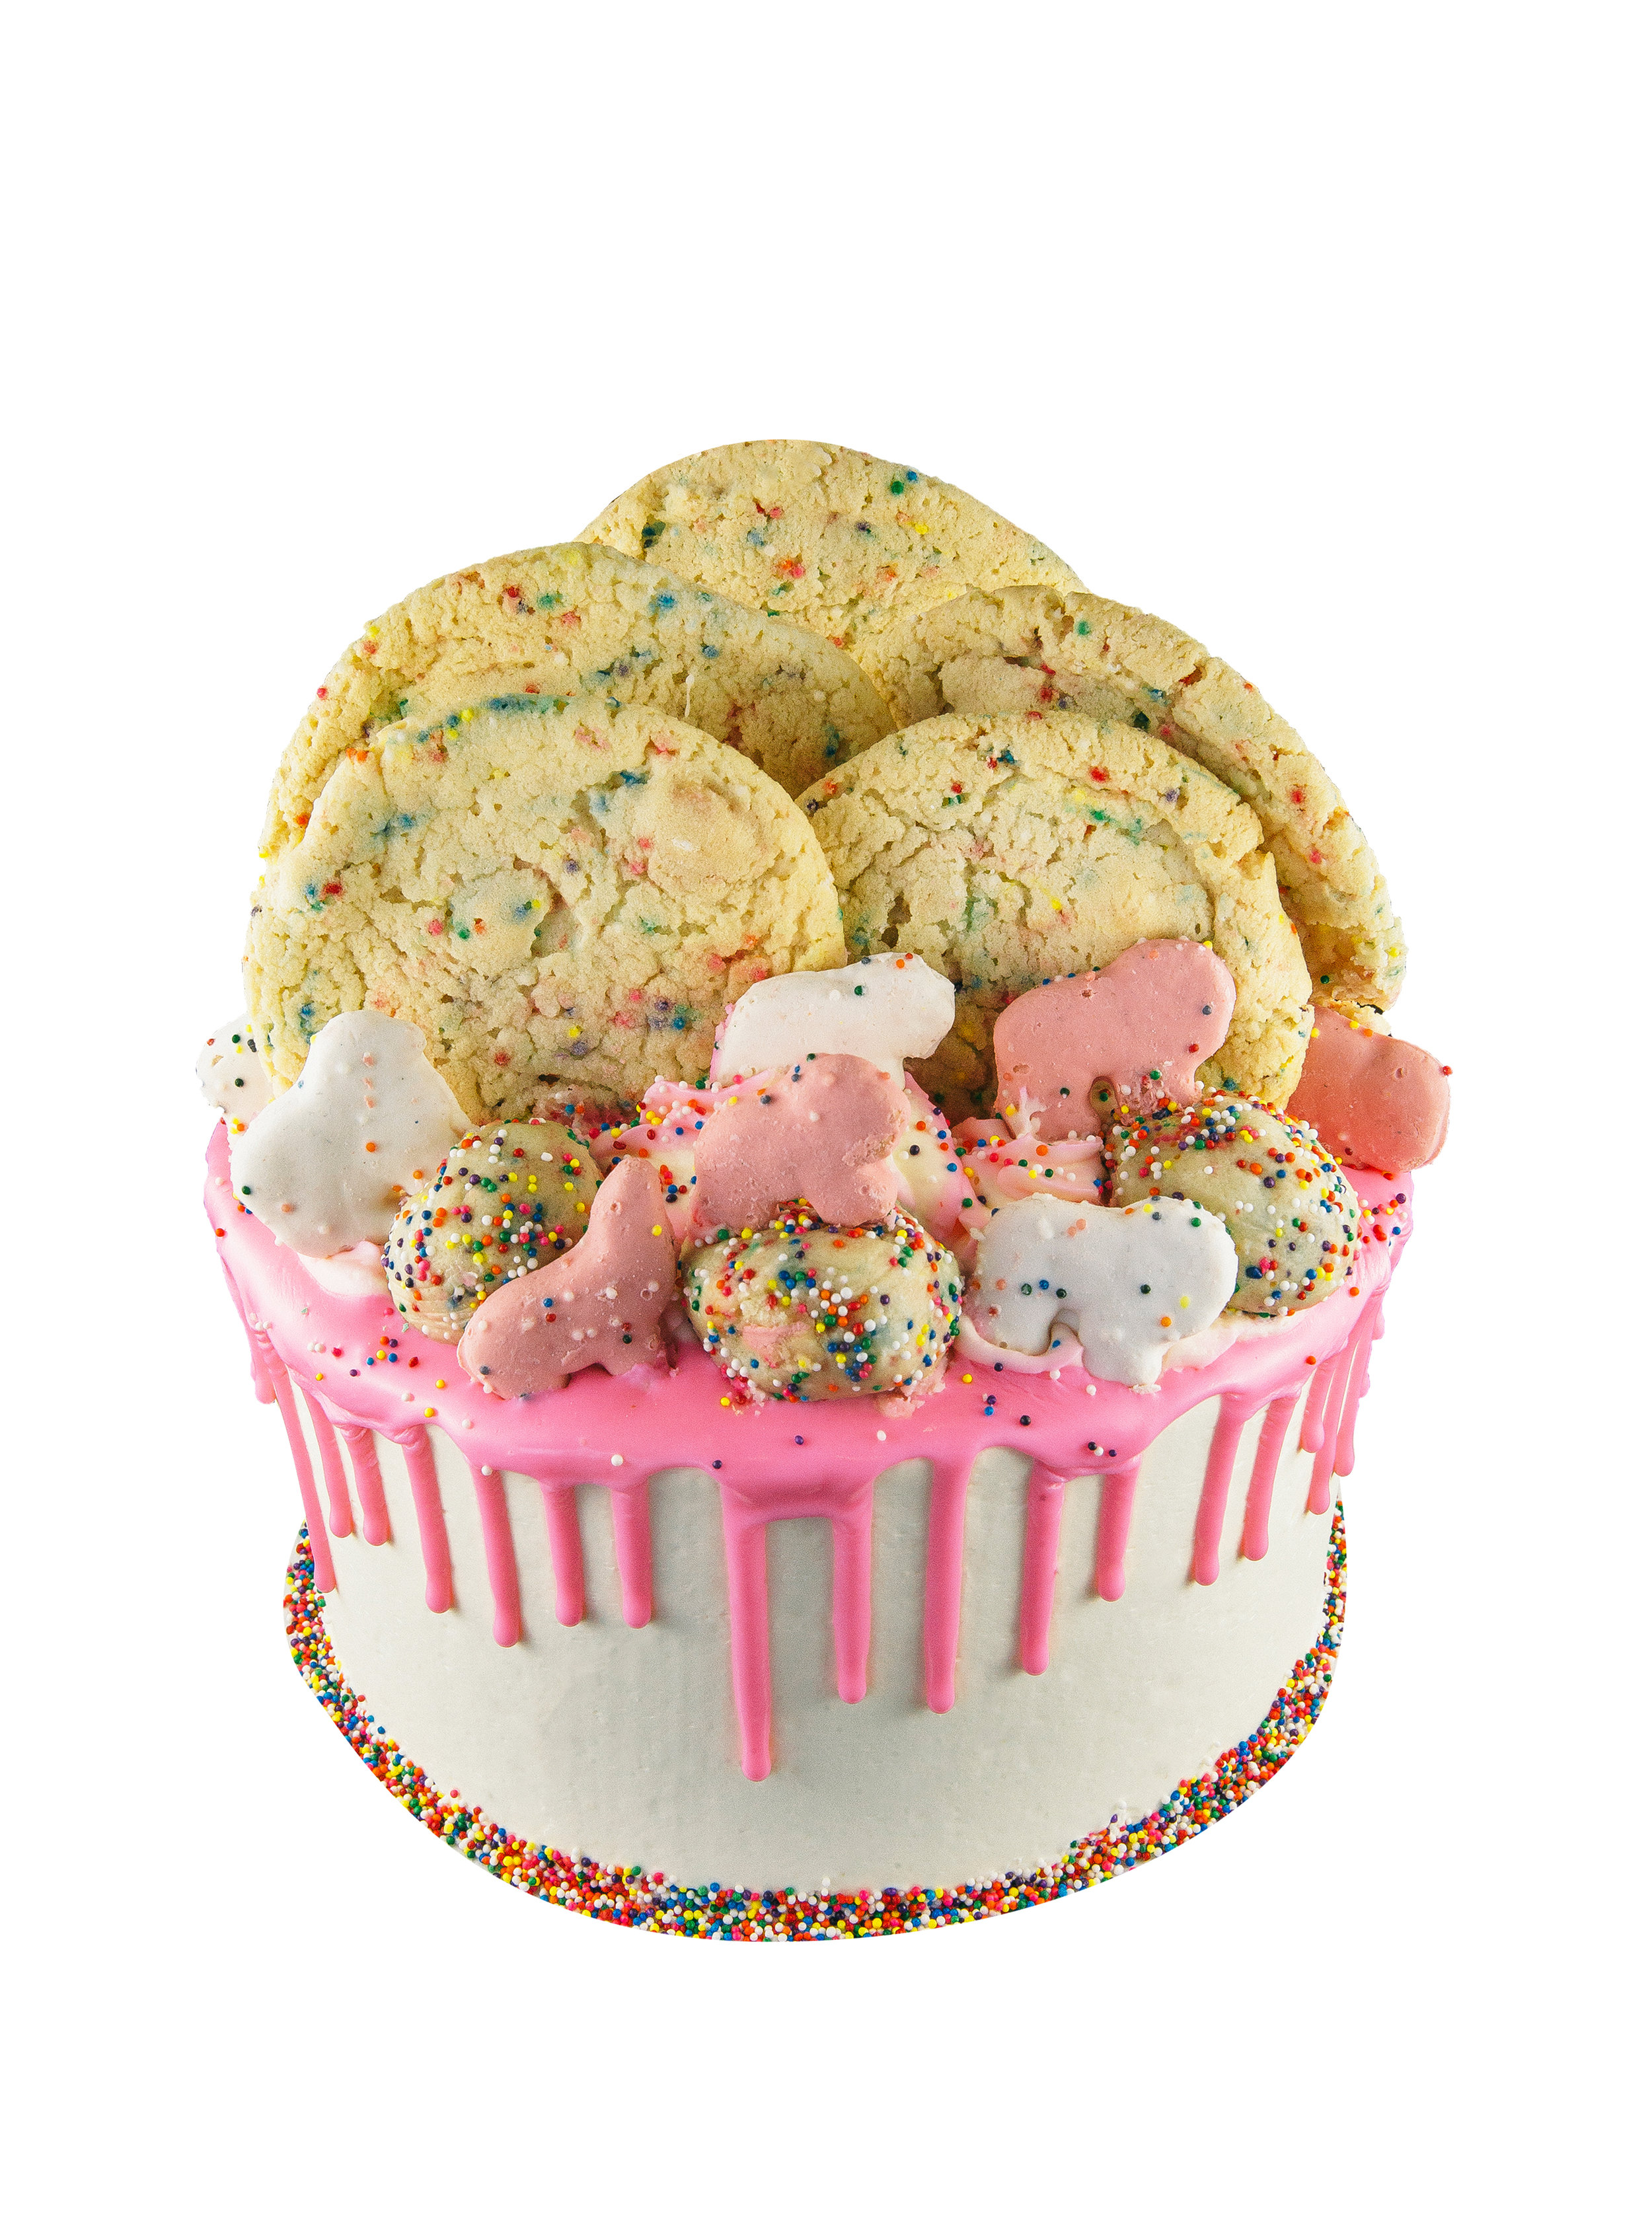 BIRTHDAY CAKE COOKIE DOUGH CAKE -